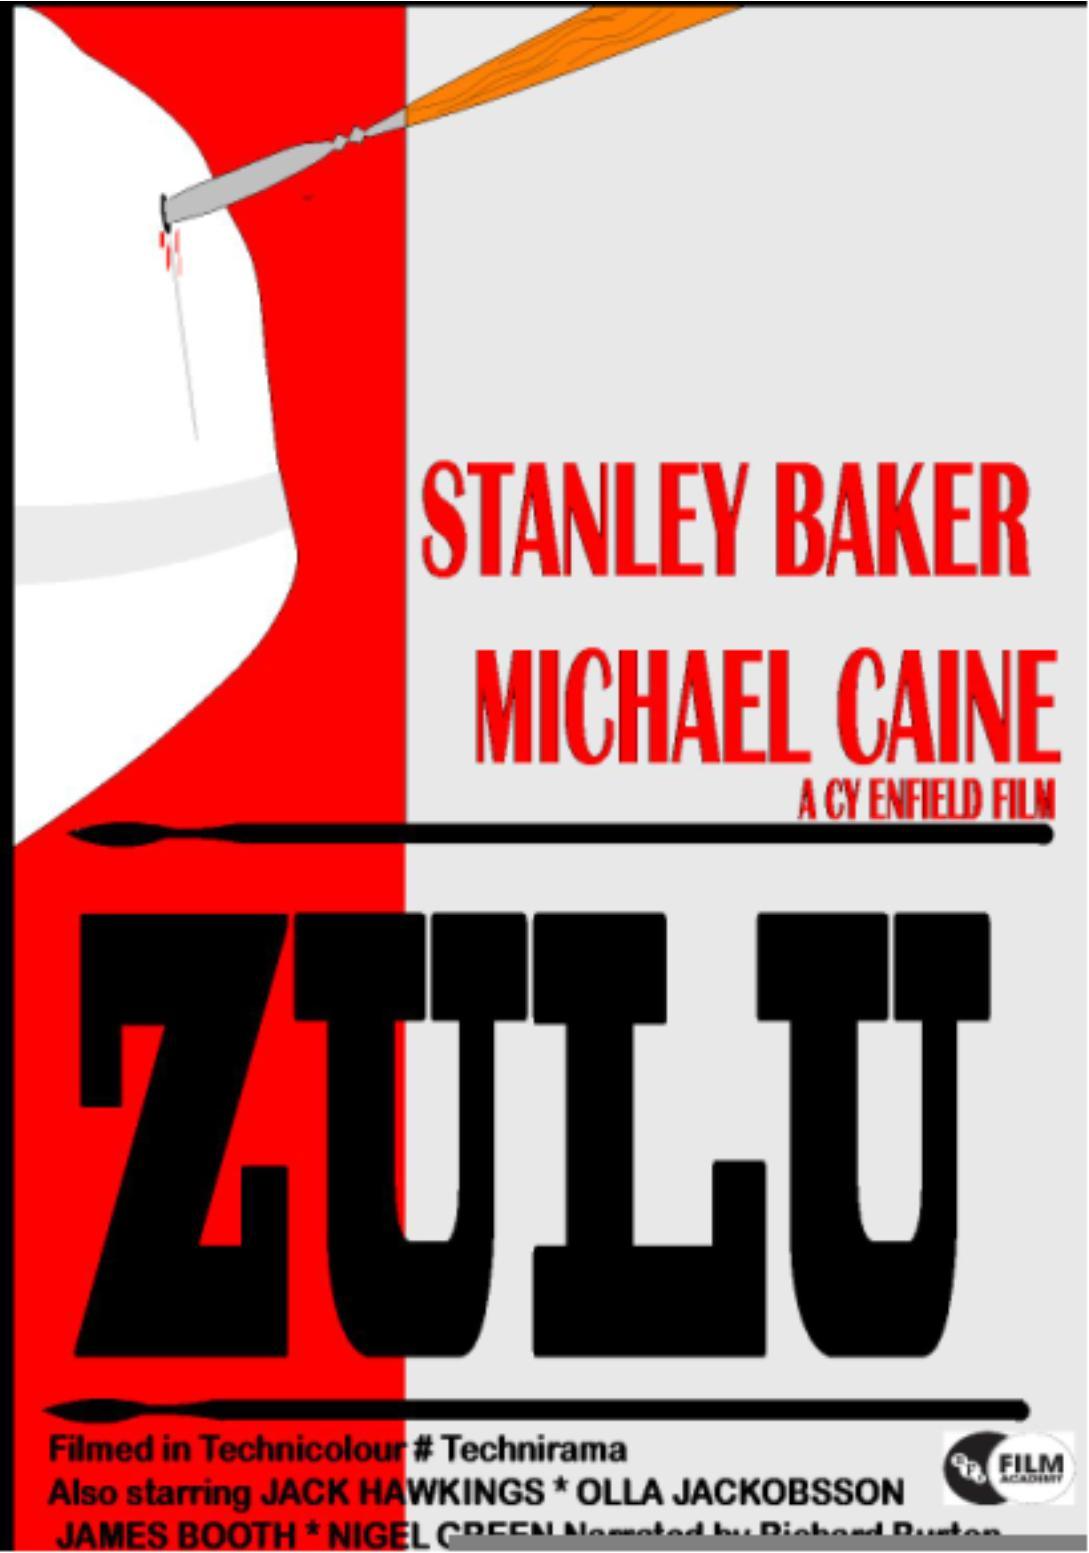 Zulu Film Poster Drawn Today At Adeyfield School Wwwfunrunrobbie